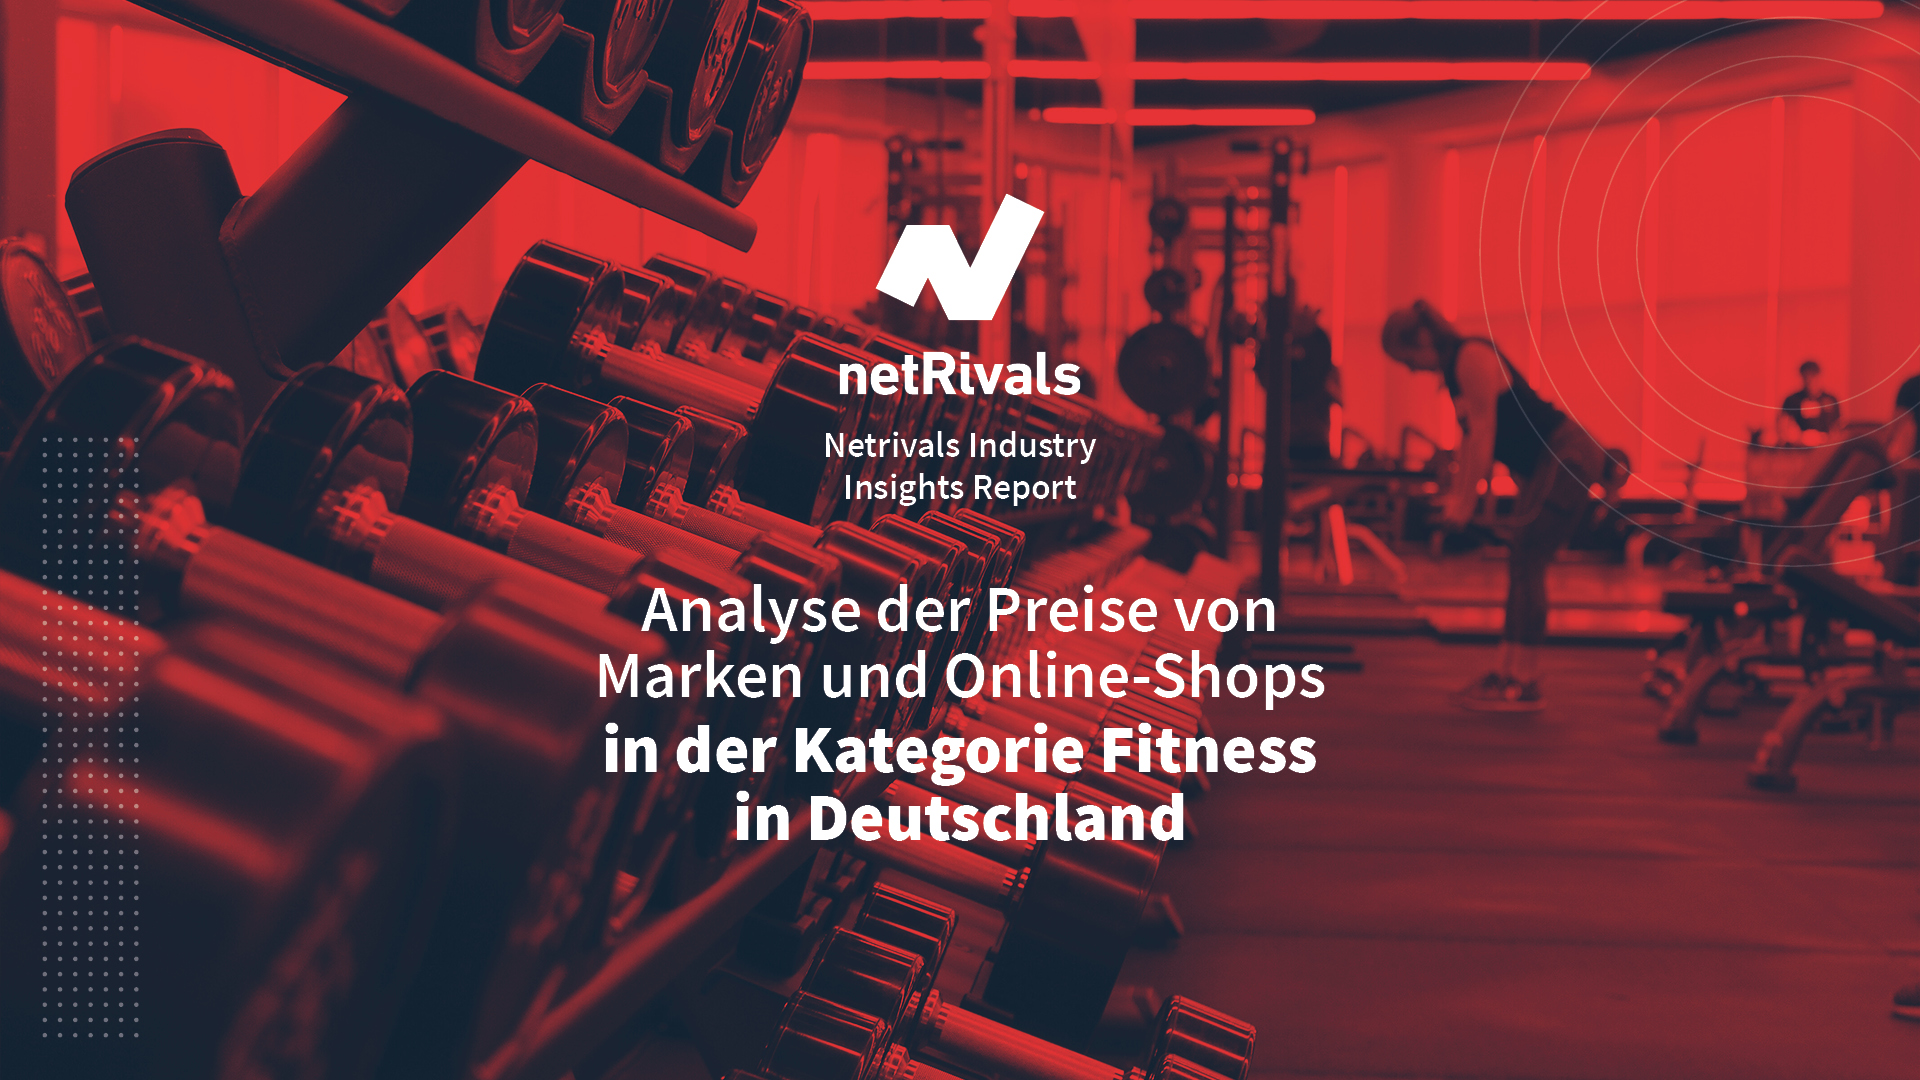 01_netRivals_Fitness_DE (1)